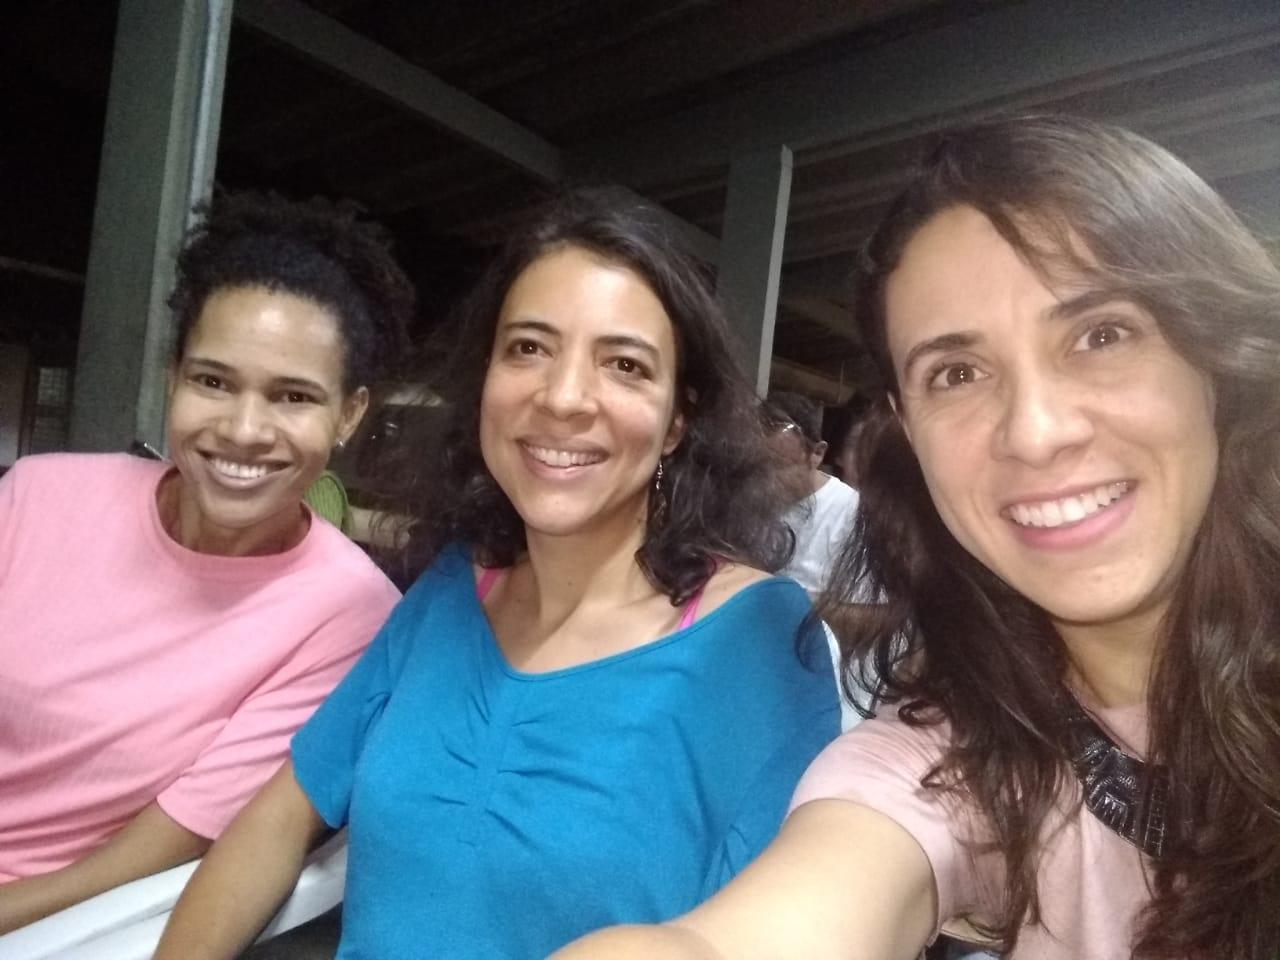 Participantes do Grupo Panecastica: da esquerda para a direita, Proffa Suzanna, Rachel e Ana Beatriz.